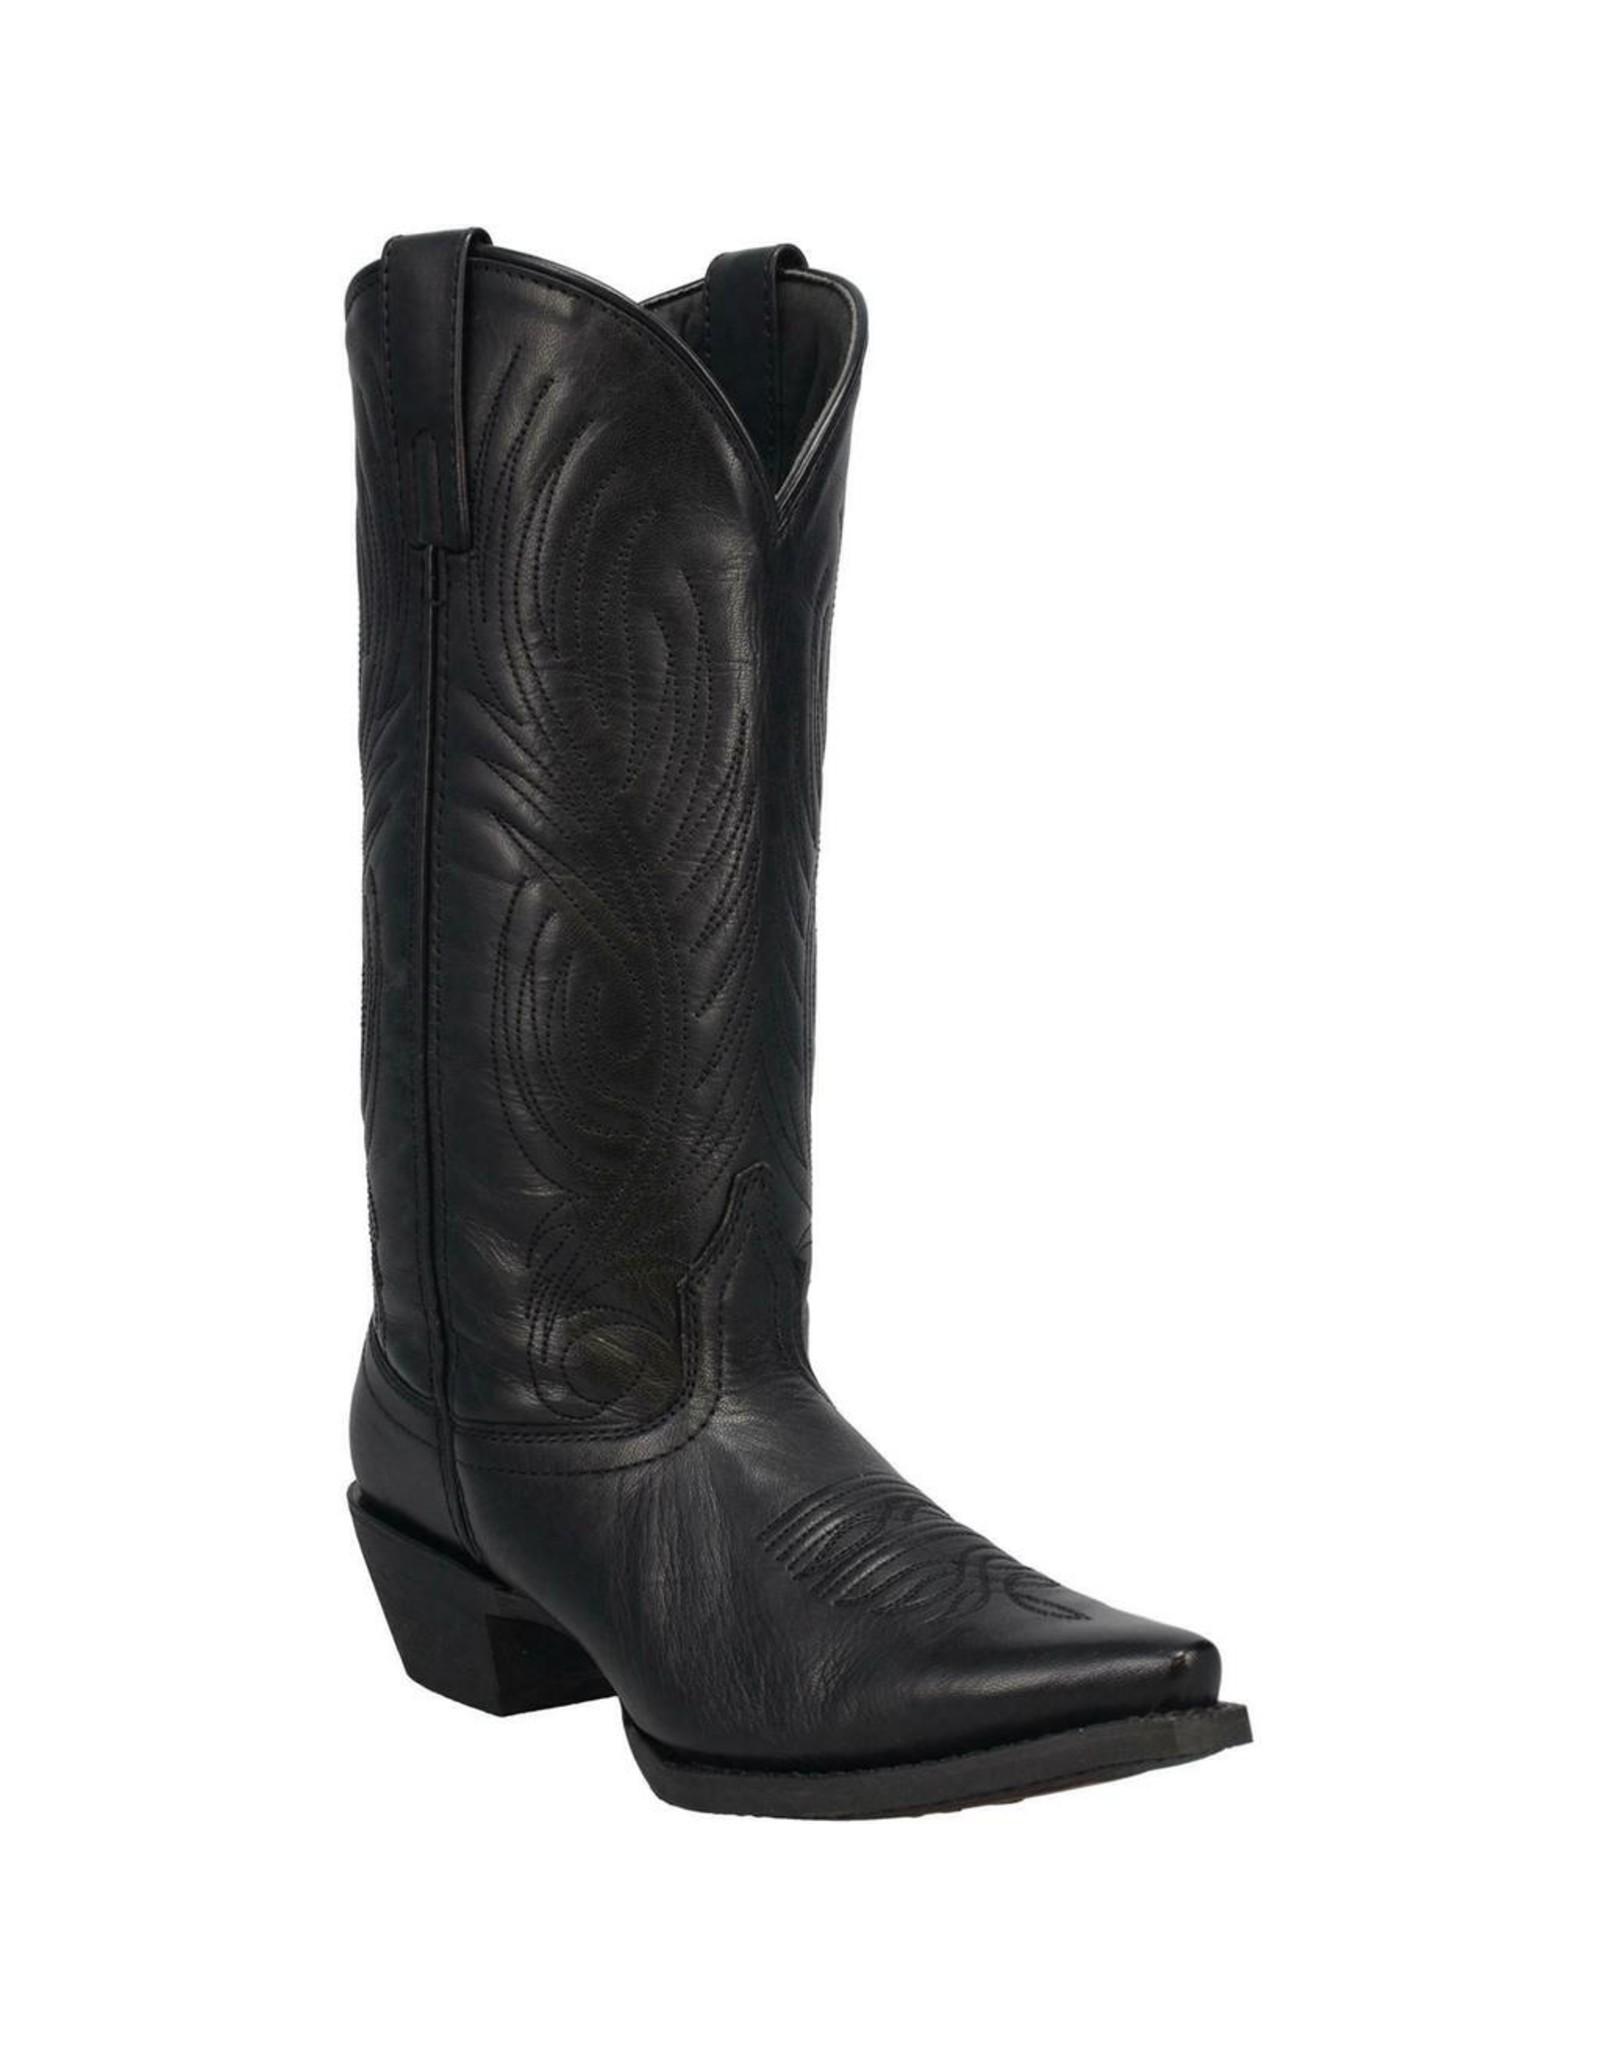 Boots-Women LAREDO Ladies 51160 #TBT